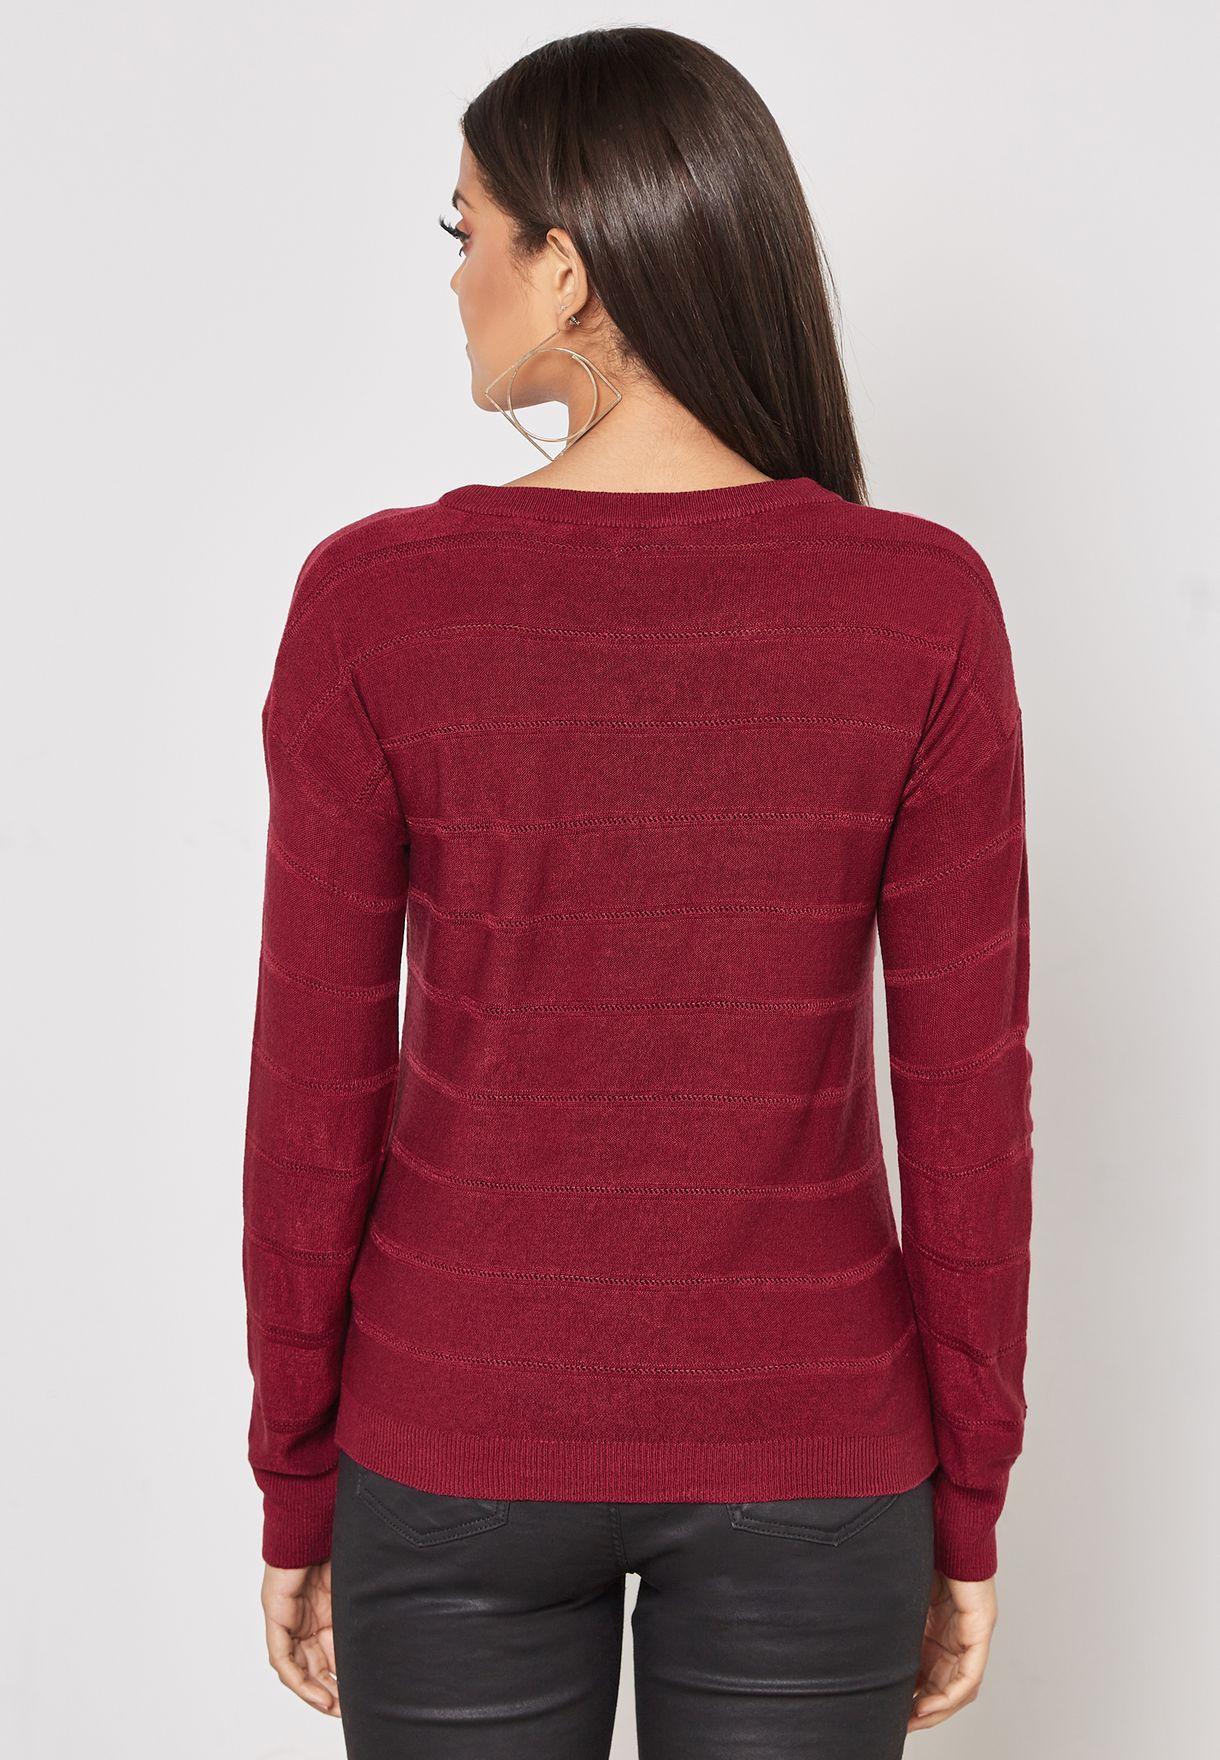 Embossed Sweater